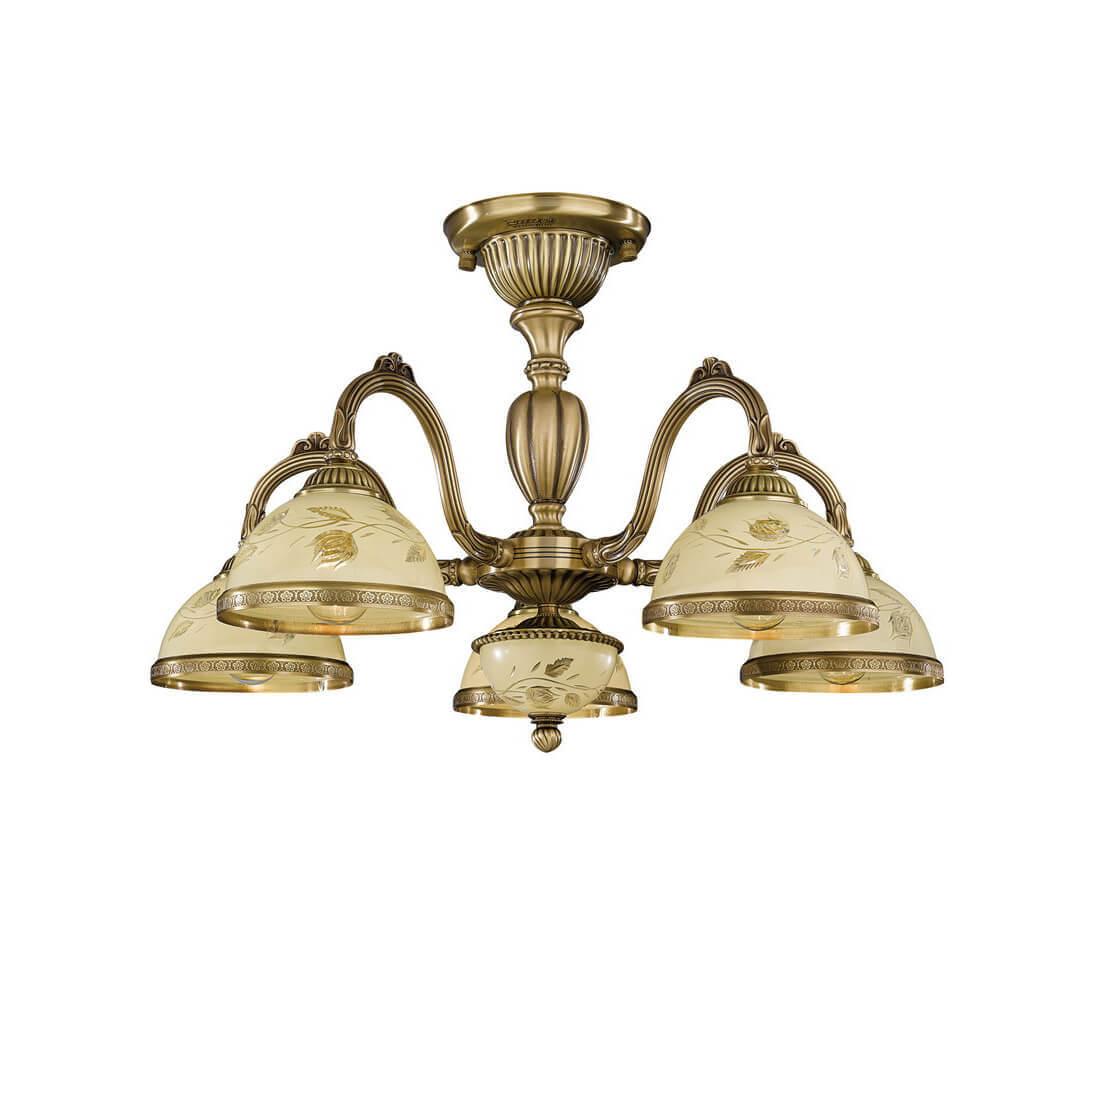 Потолочная люстра Reccagni Angelo PL 6228/5 потолочная люстра reccagni angelo pl 6228 5